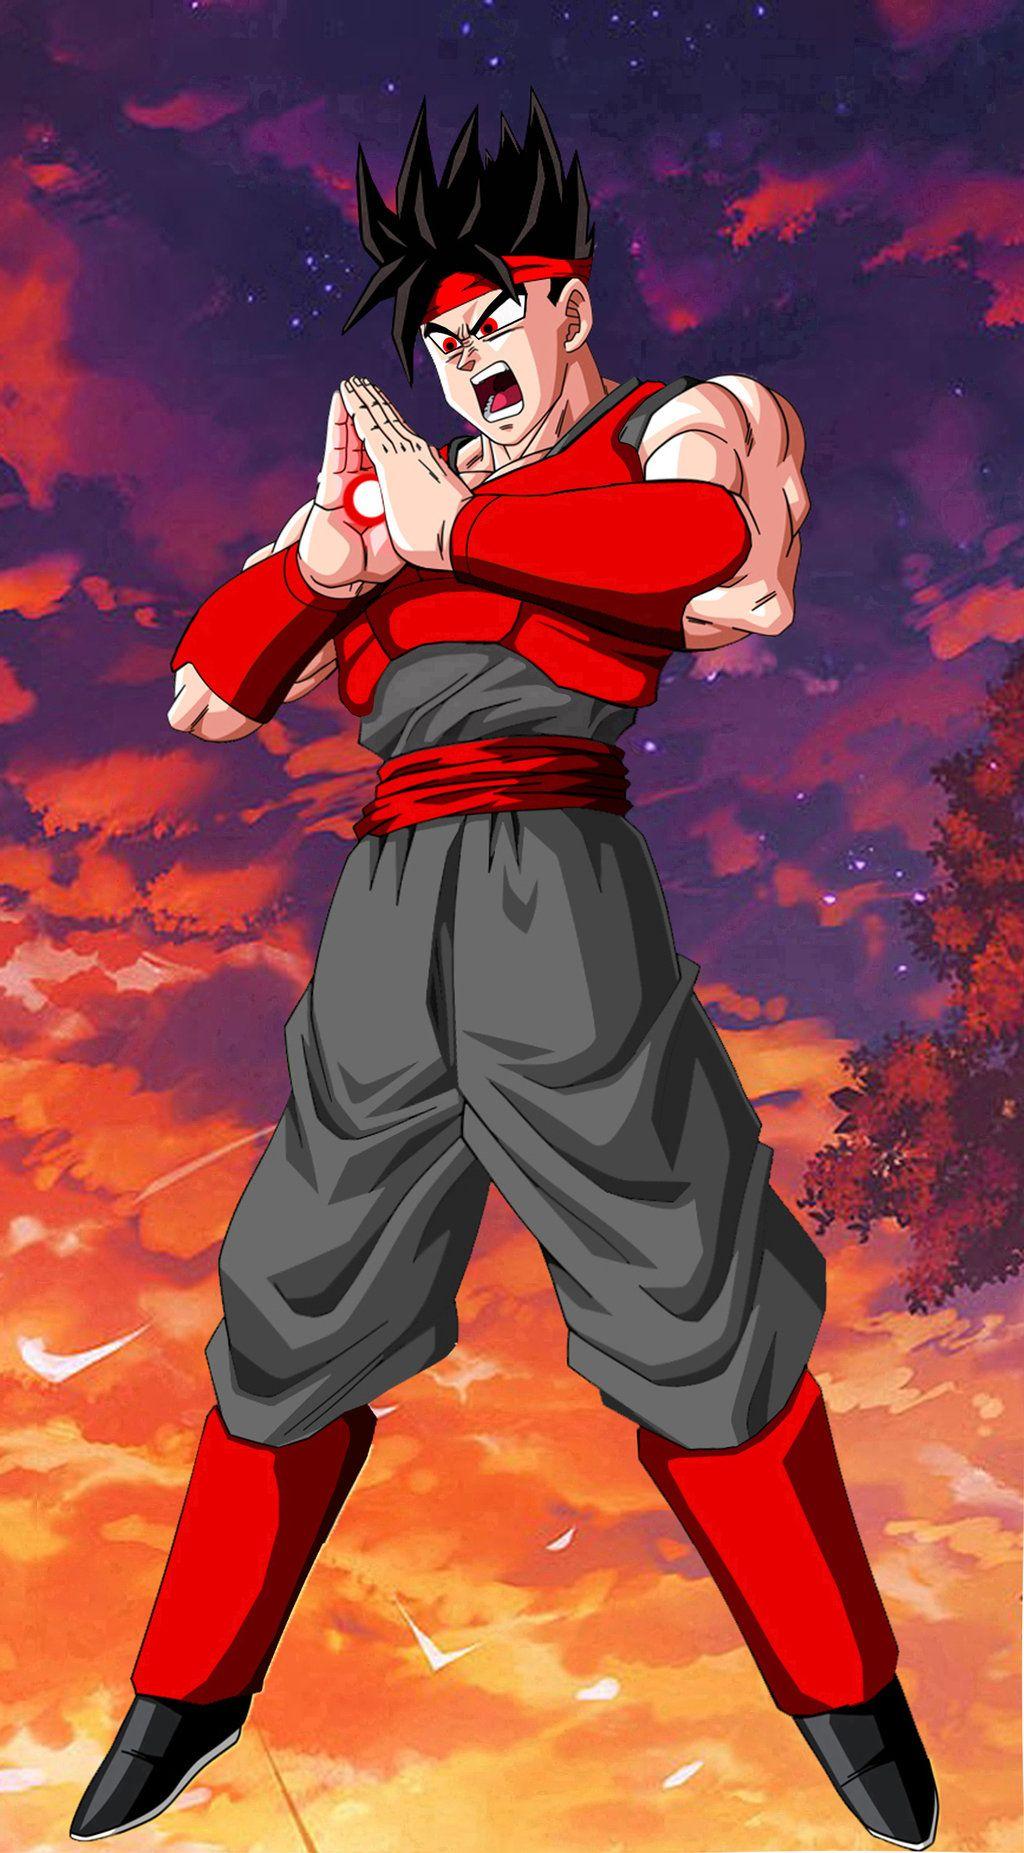 Android 21 Mugen Kikoho Anime Dragon Ball Super Dragon Ball Artwork Dragon Ball Art